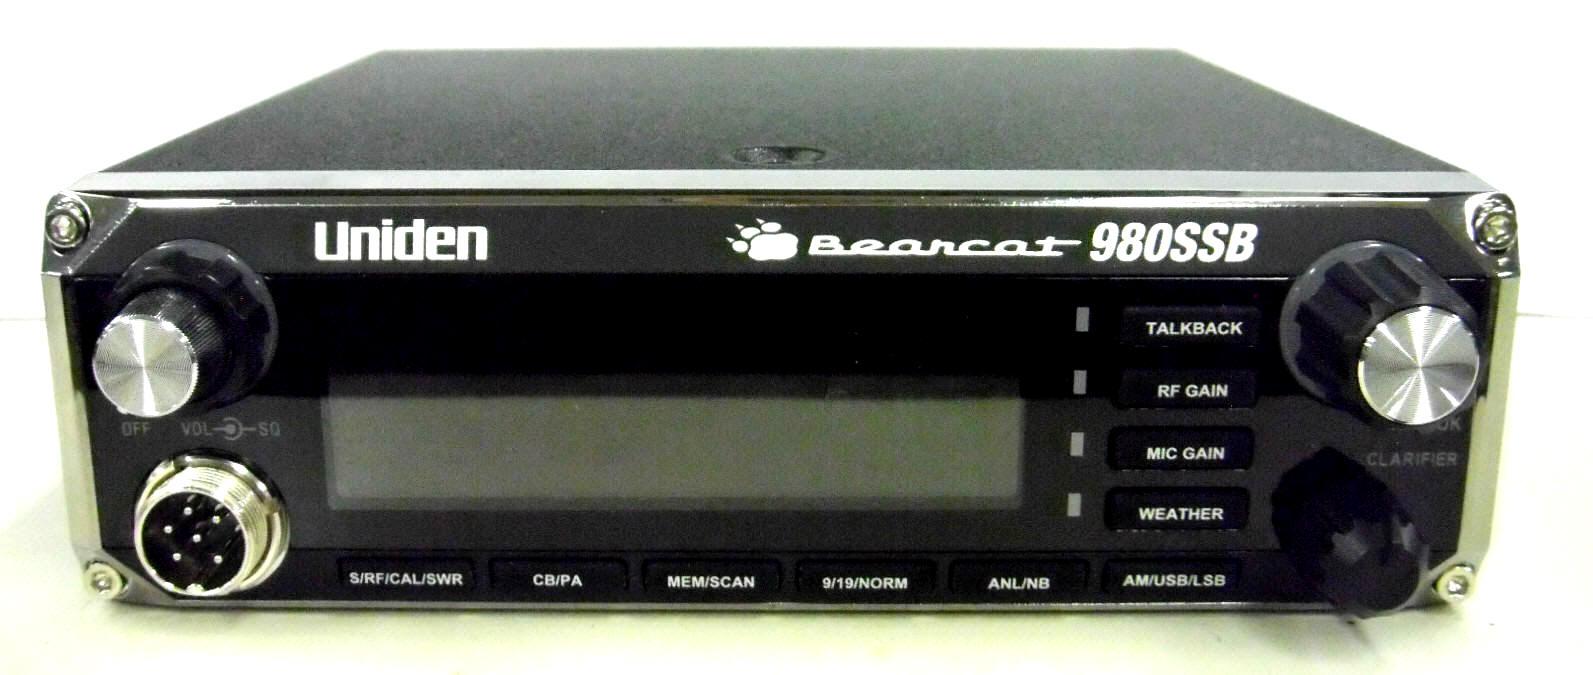 uniden bearcat 980 ssb owners manual